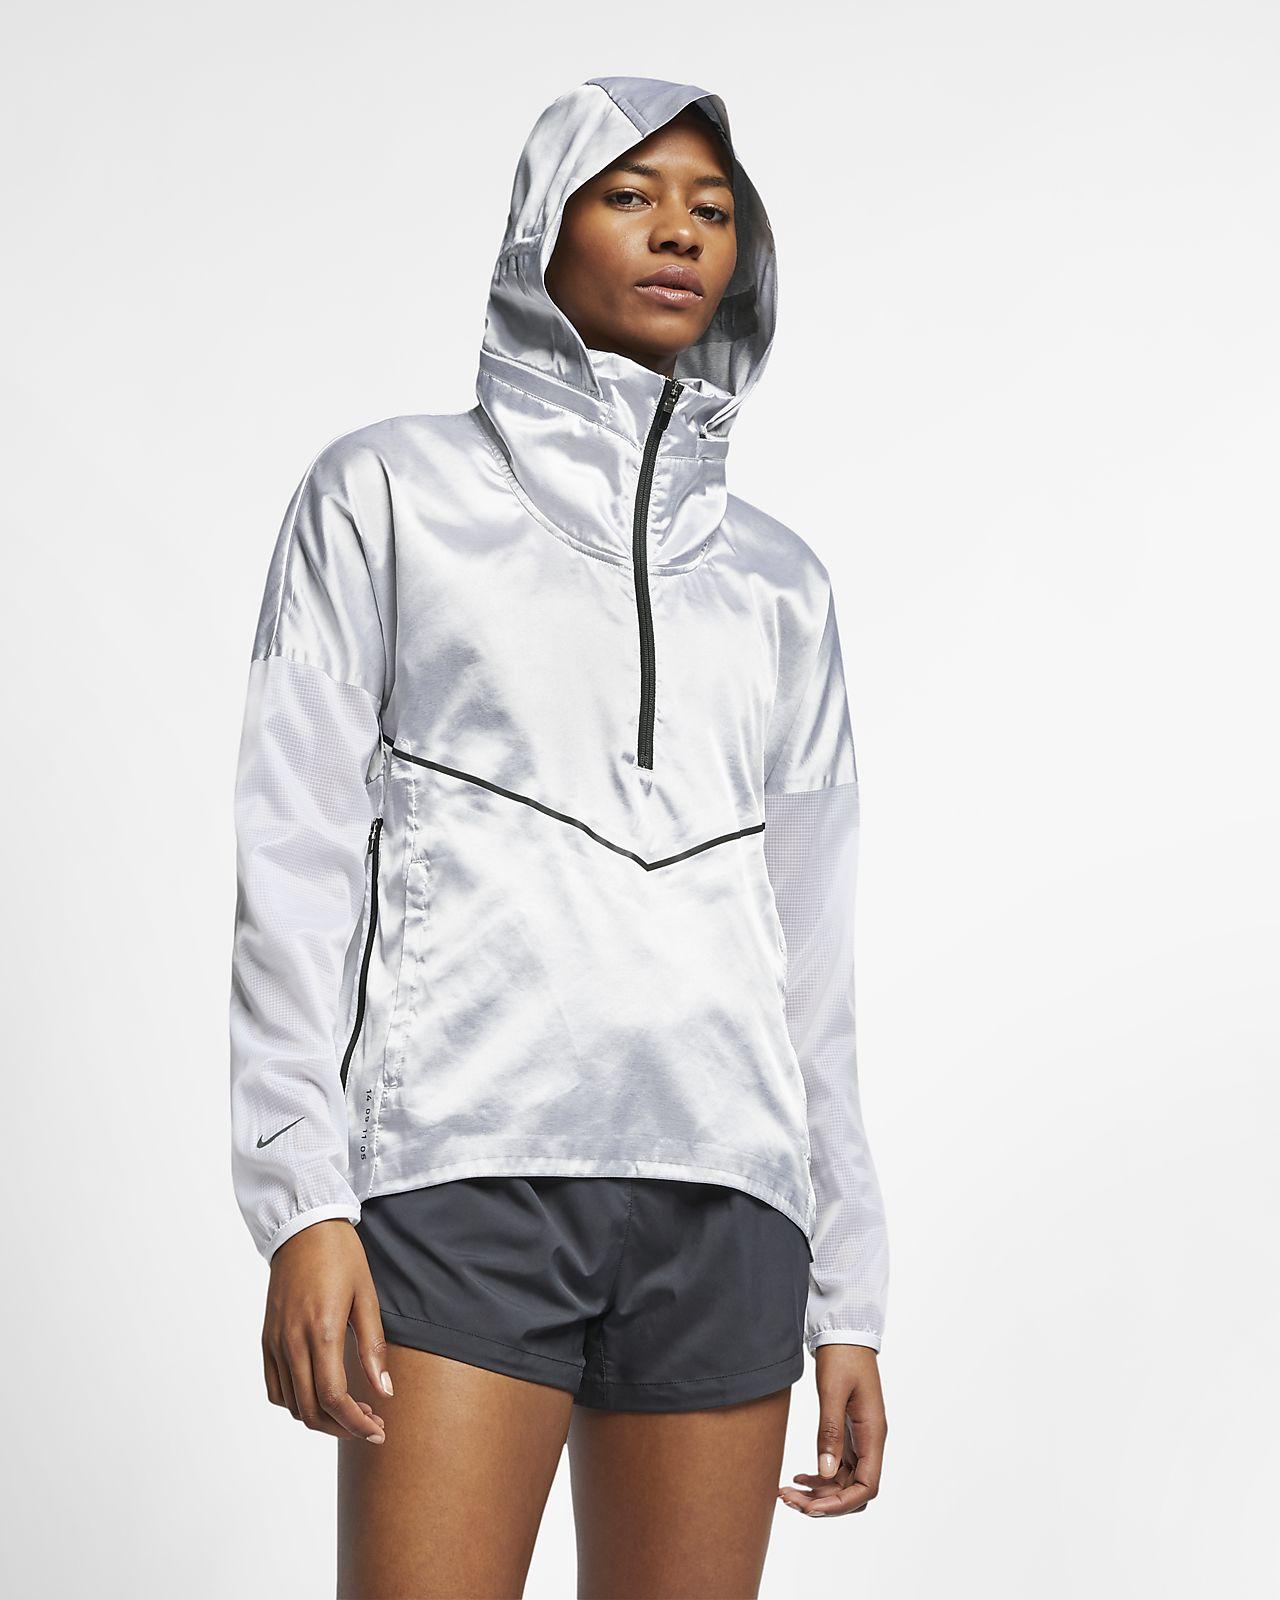 Nike Damen-Laufjacke mit Kapuze